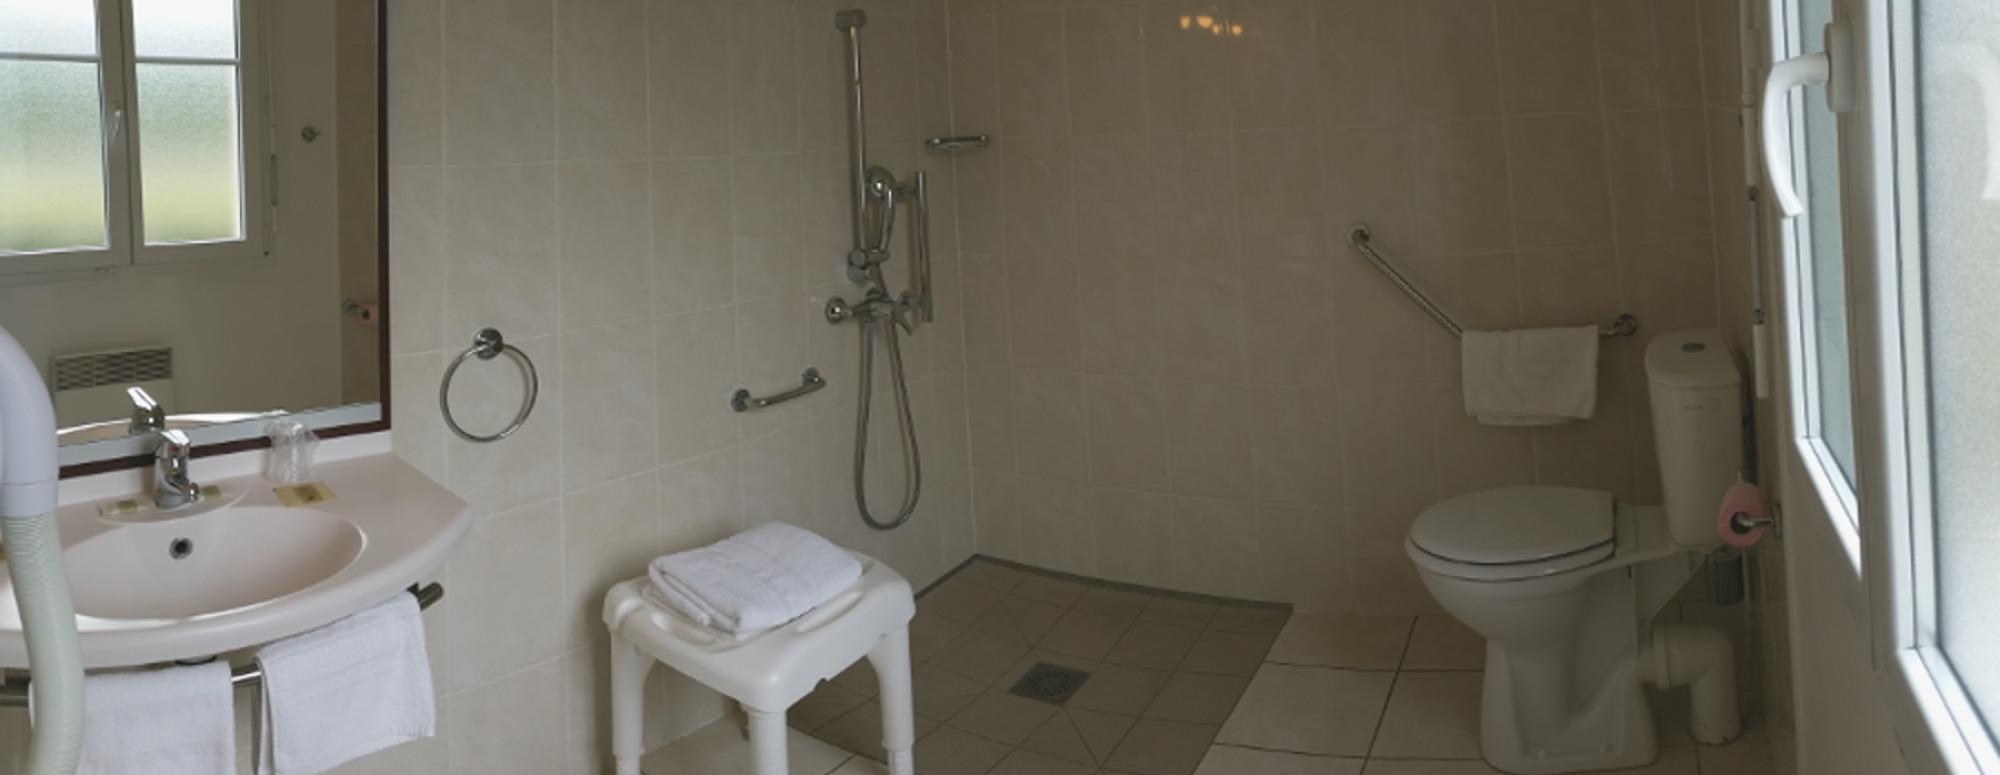 Salle de bain PMR Châteaudun en Eure et Loir